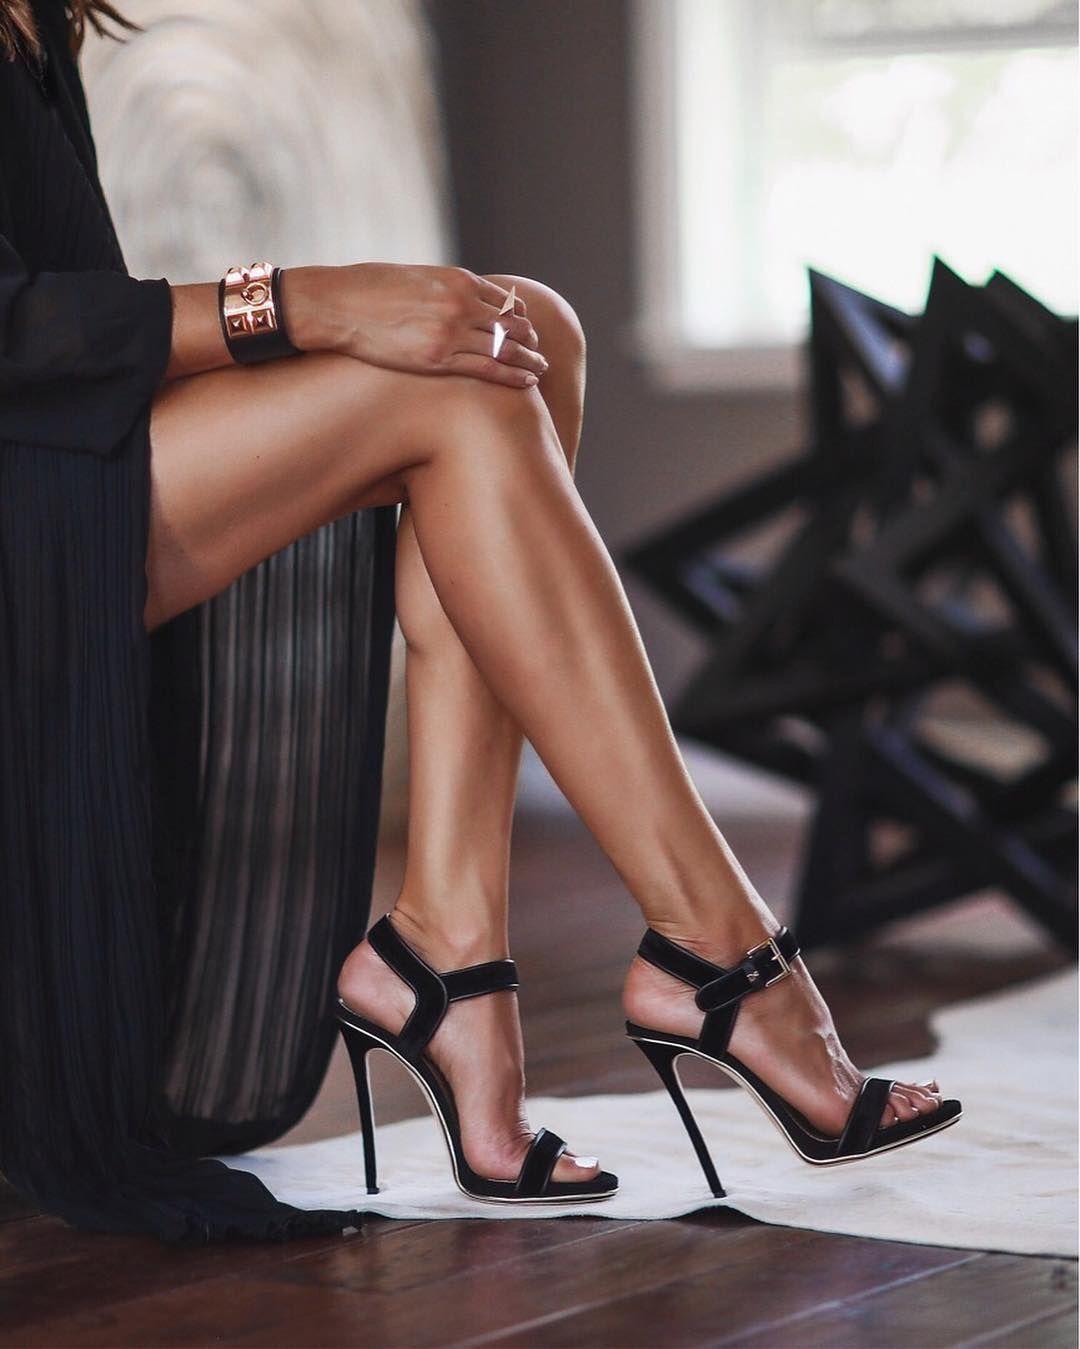 Her Sexy Legs Feet Strappy Heels